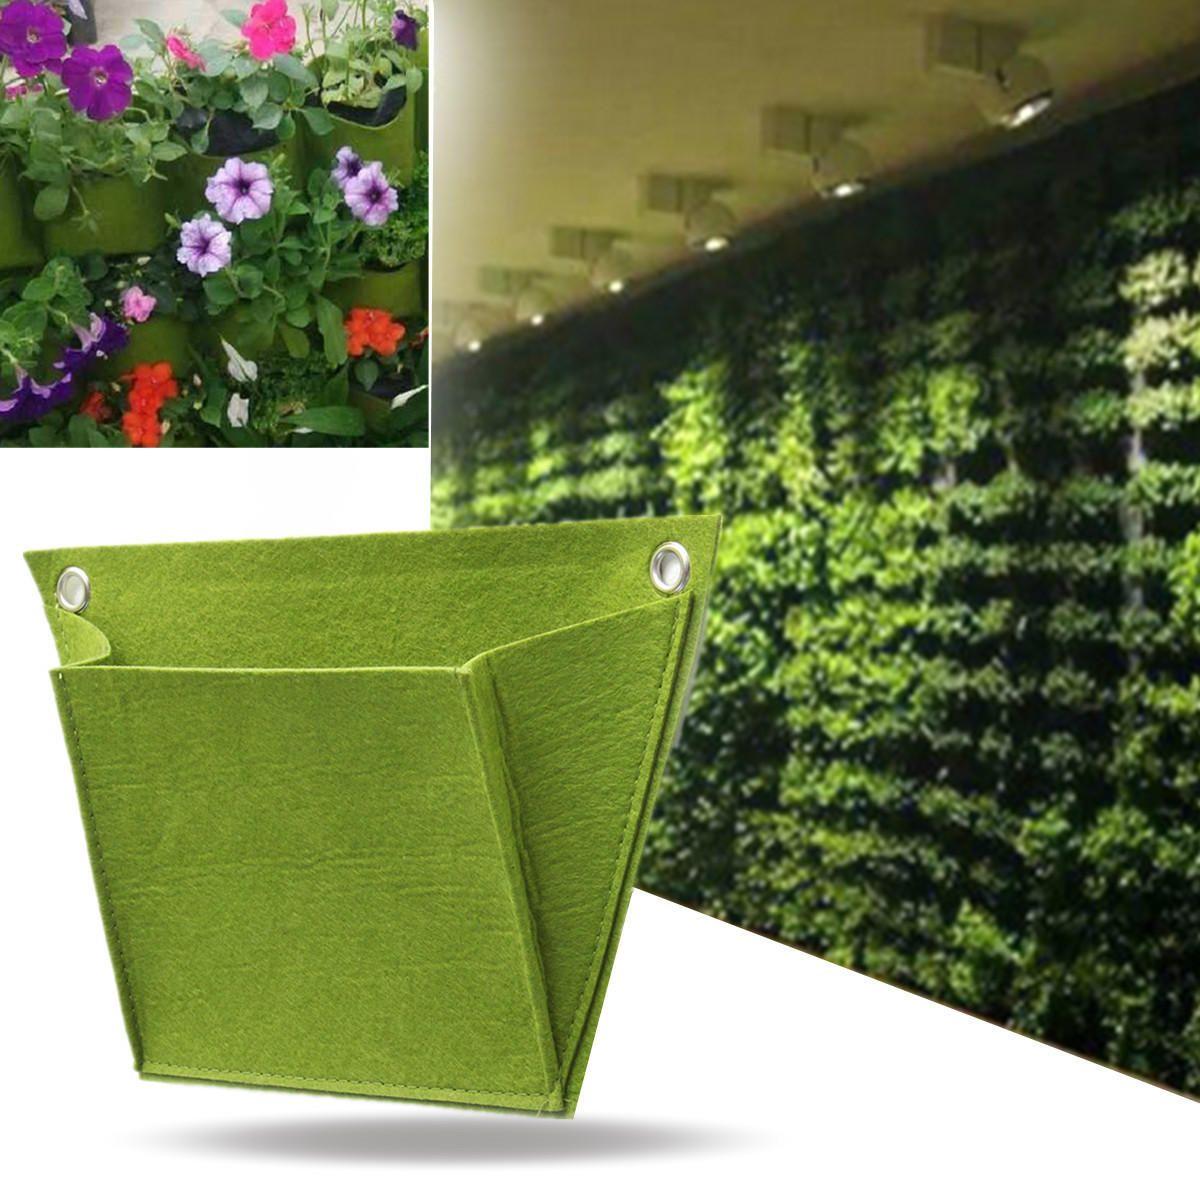 Nonwovend Durable Outdoor Indoor Wall Balcony Herbs